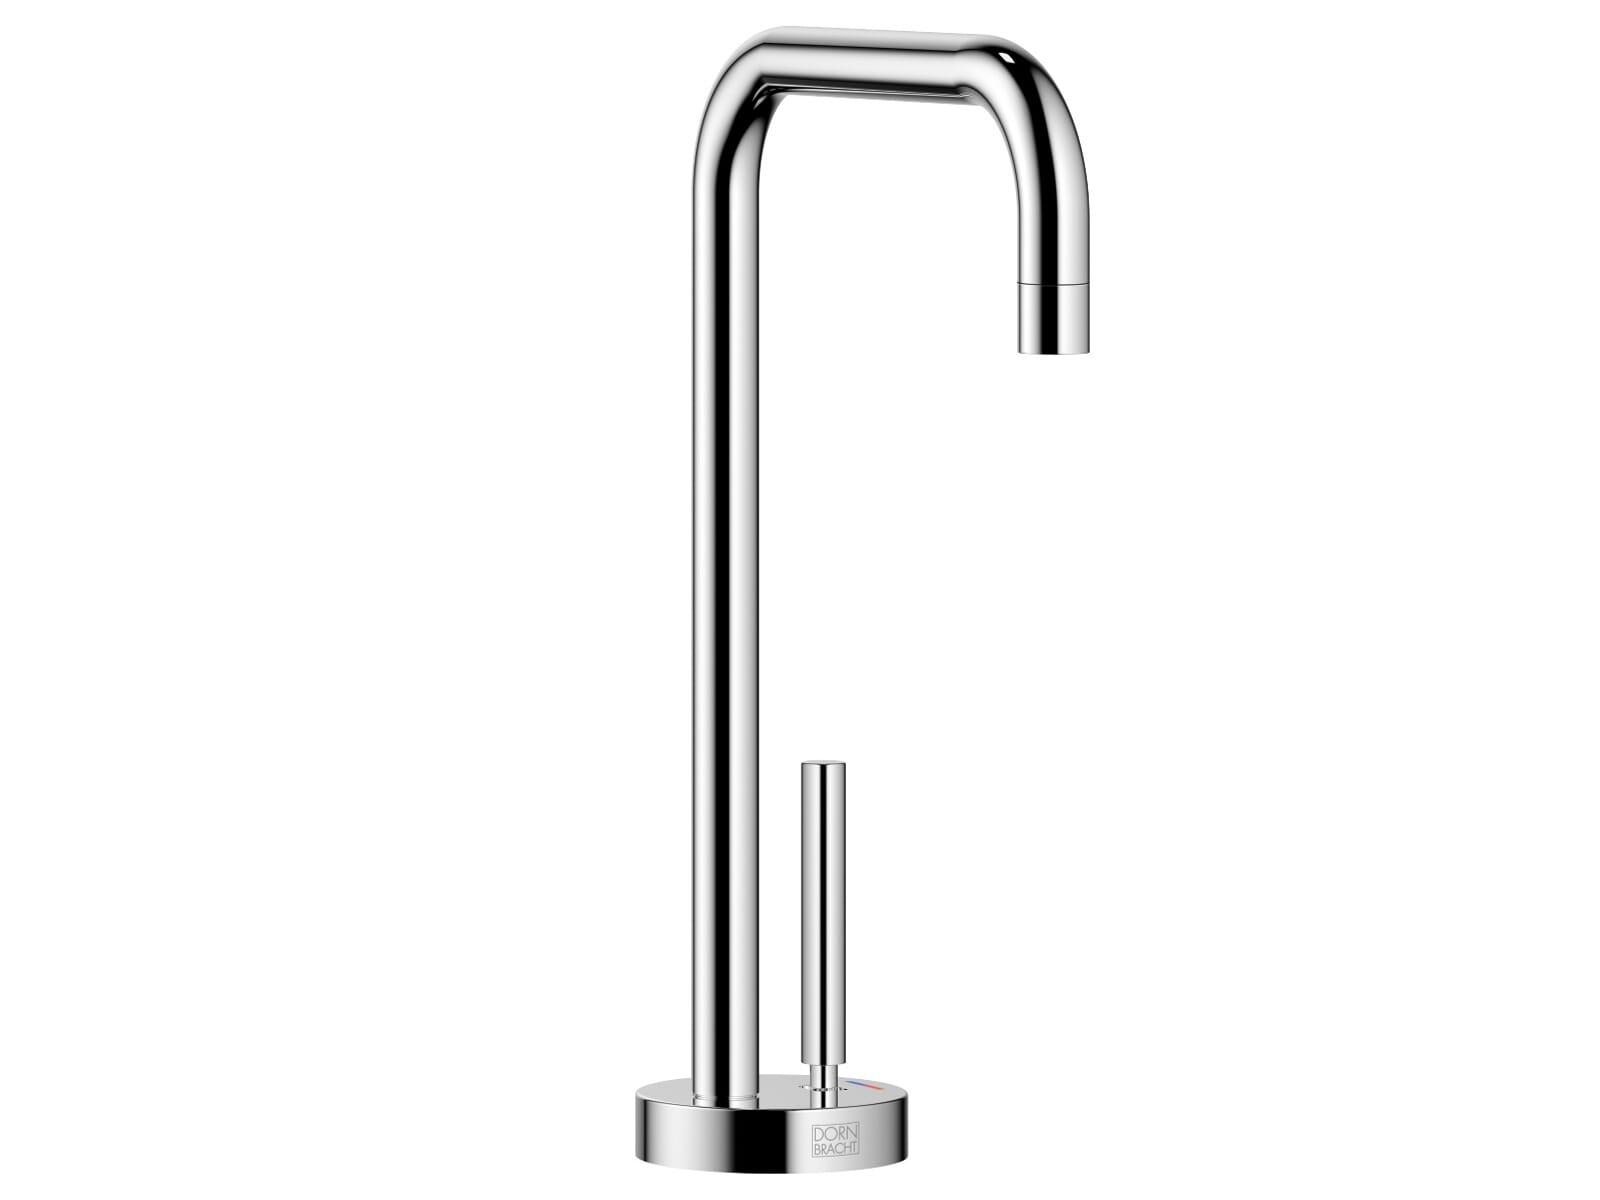 Dornbracht Meta.02 Hot & Cold Water Dispenser Chrom 17 861 625-00 Hochdruckarmatur